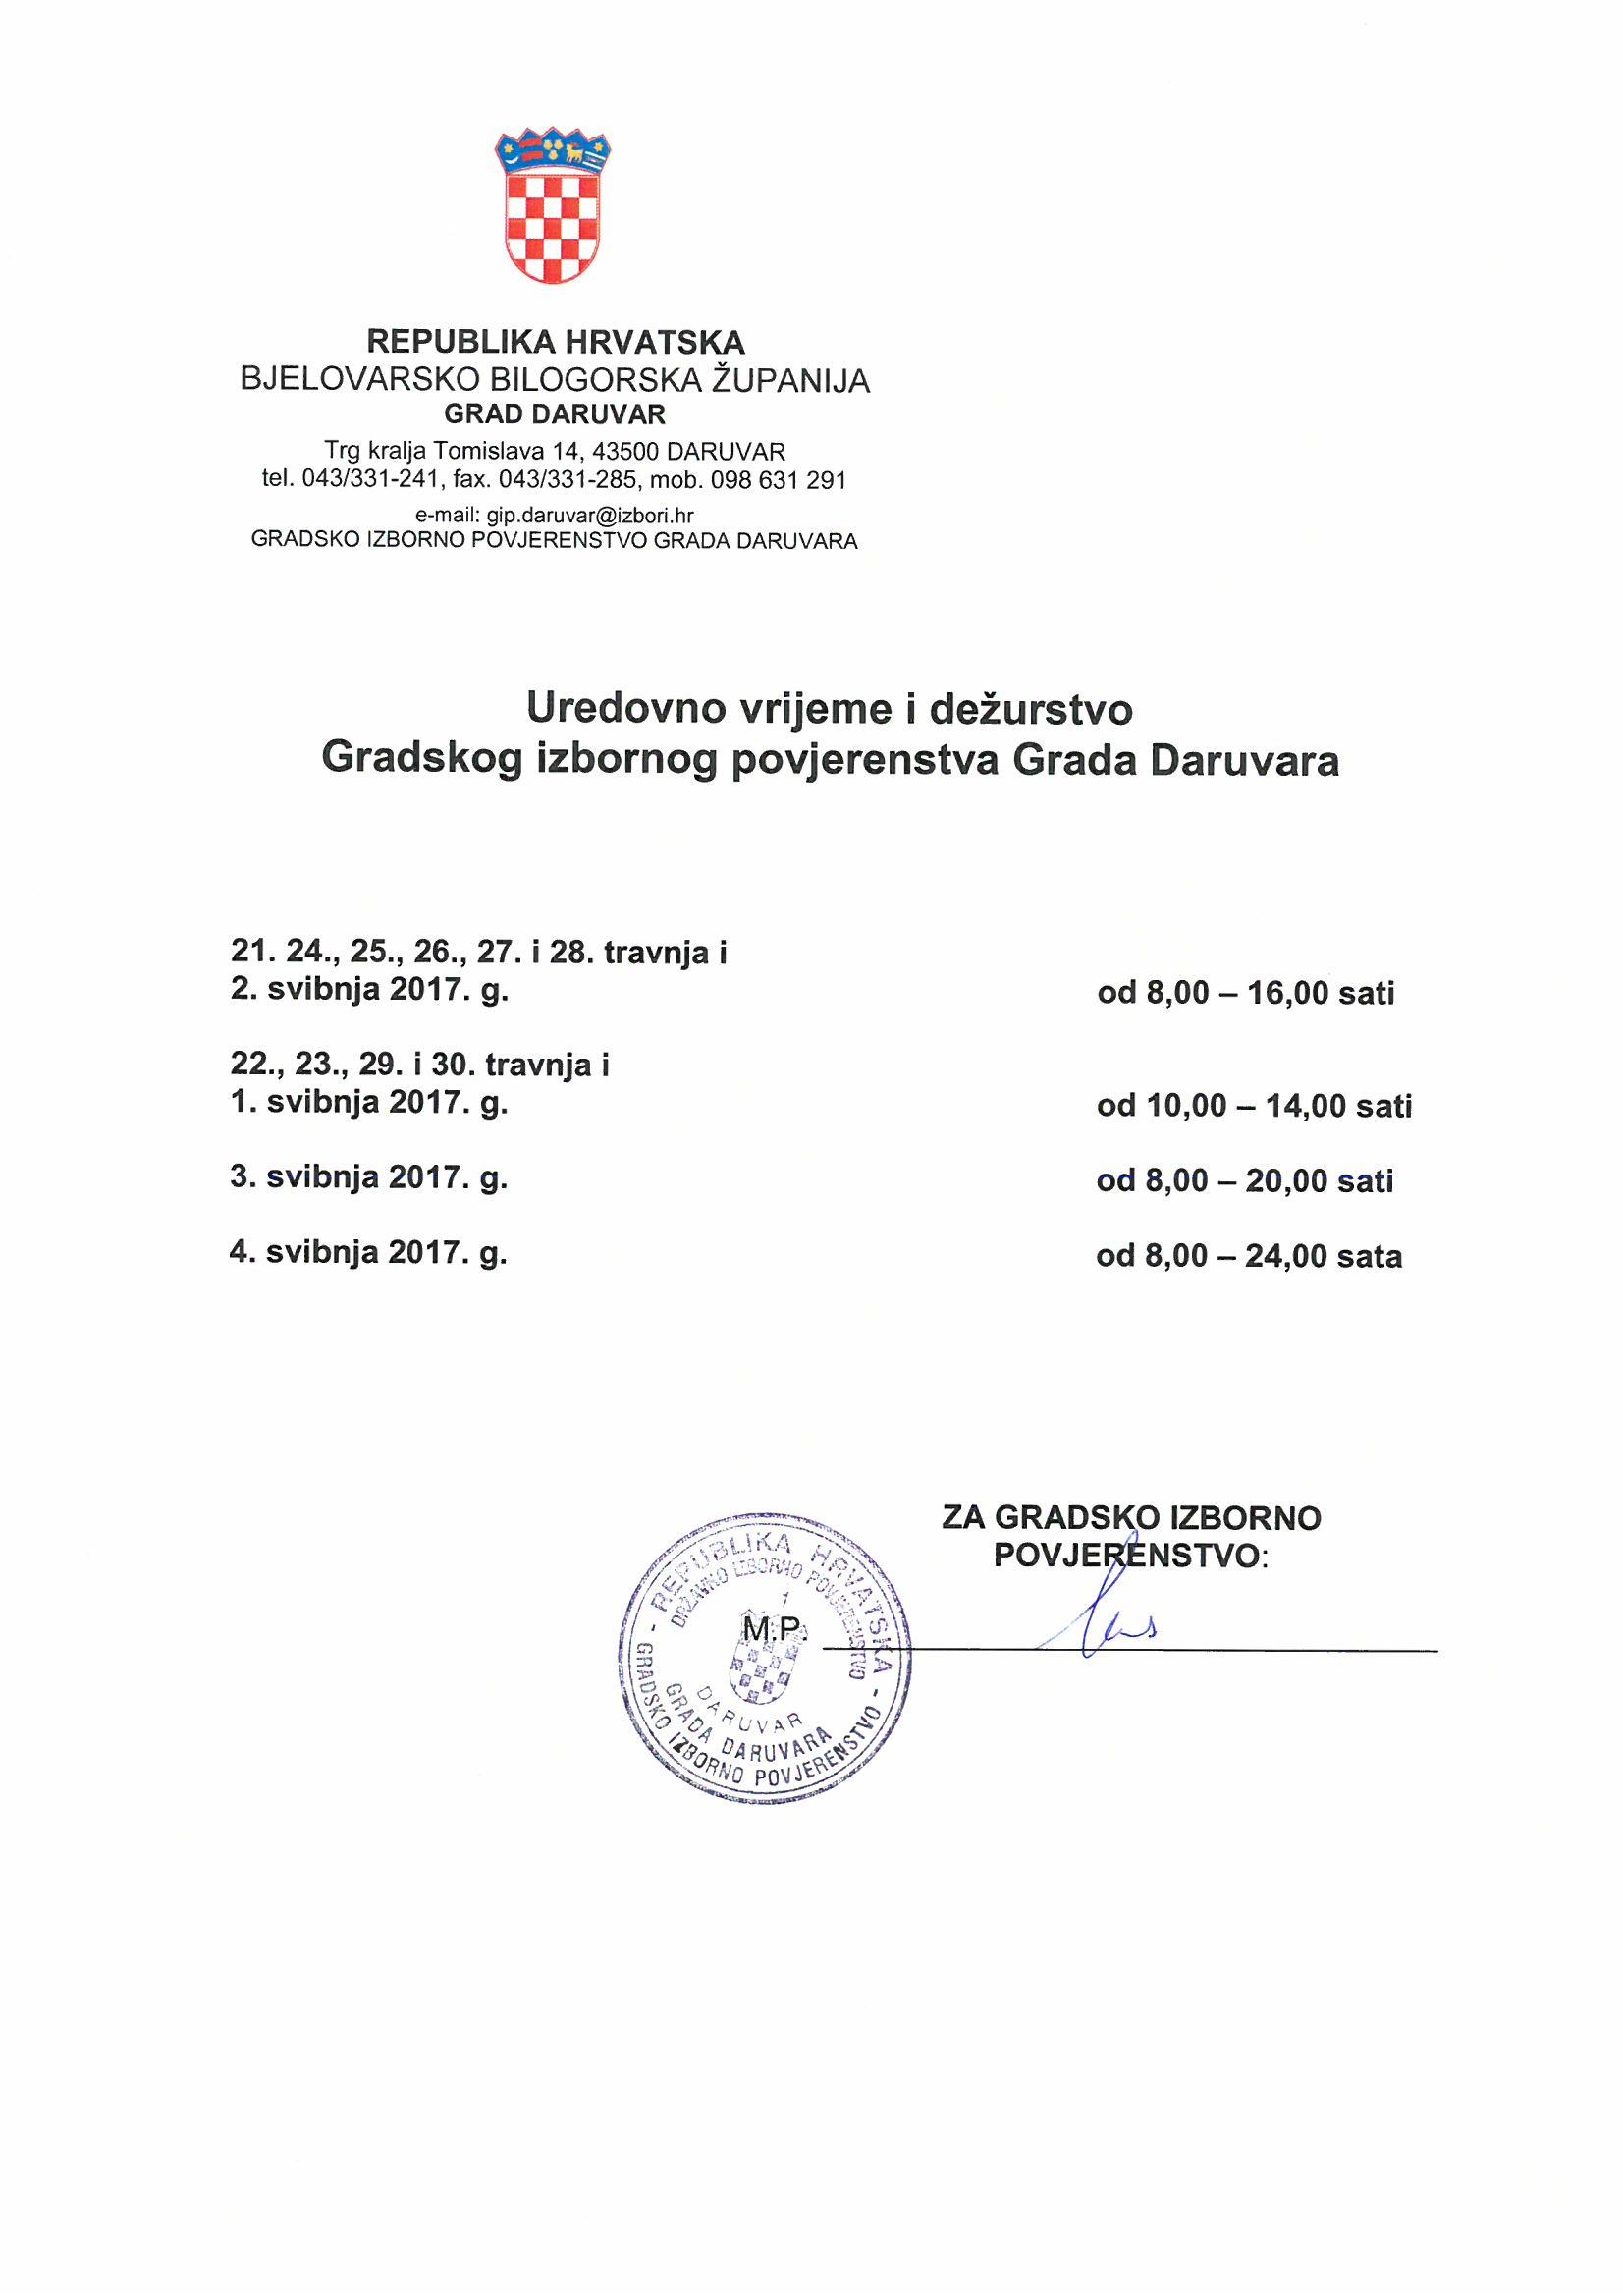 SGRAD_DARUV17042110160_0001